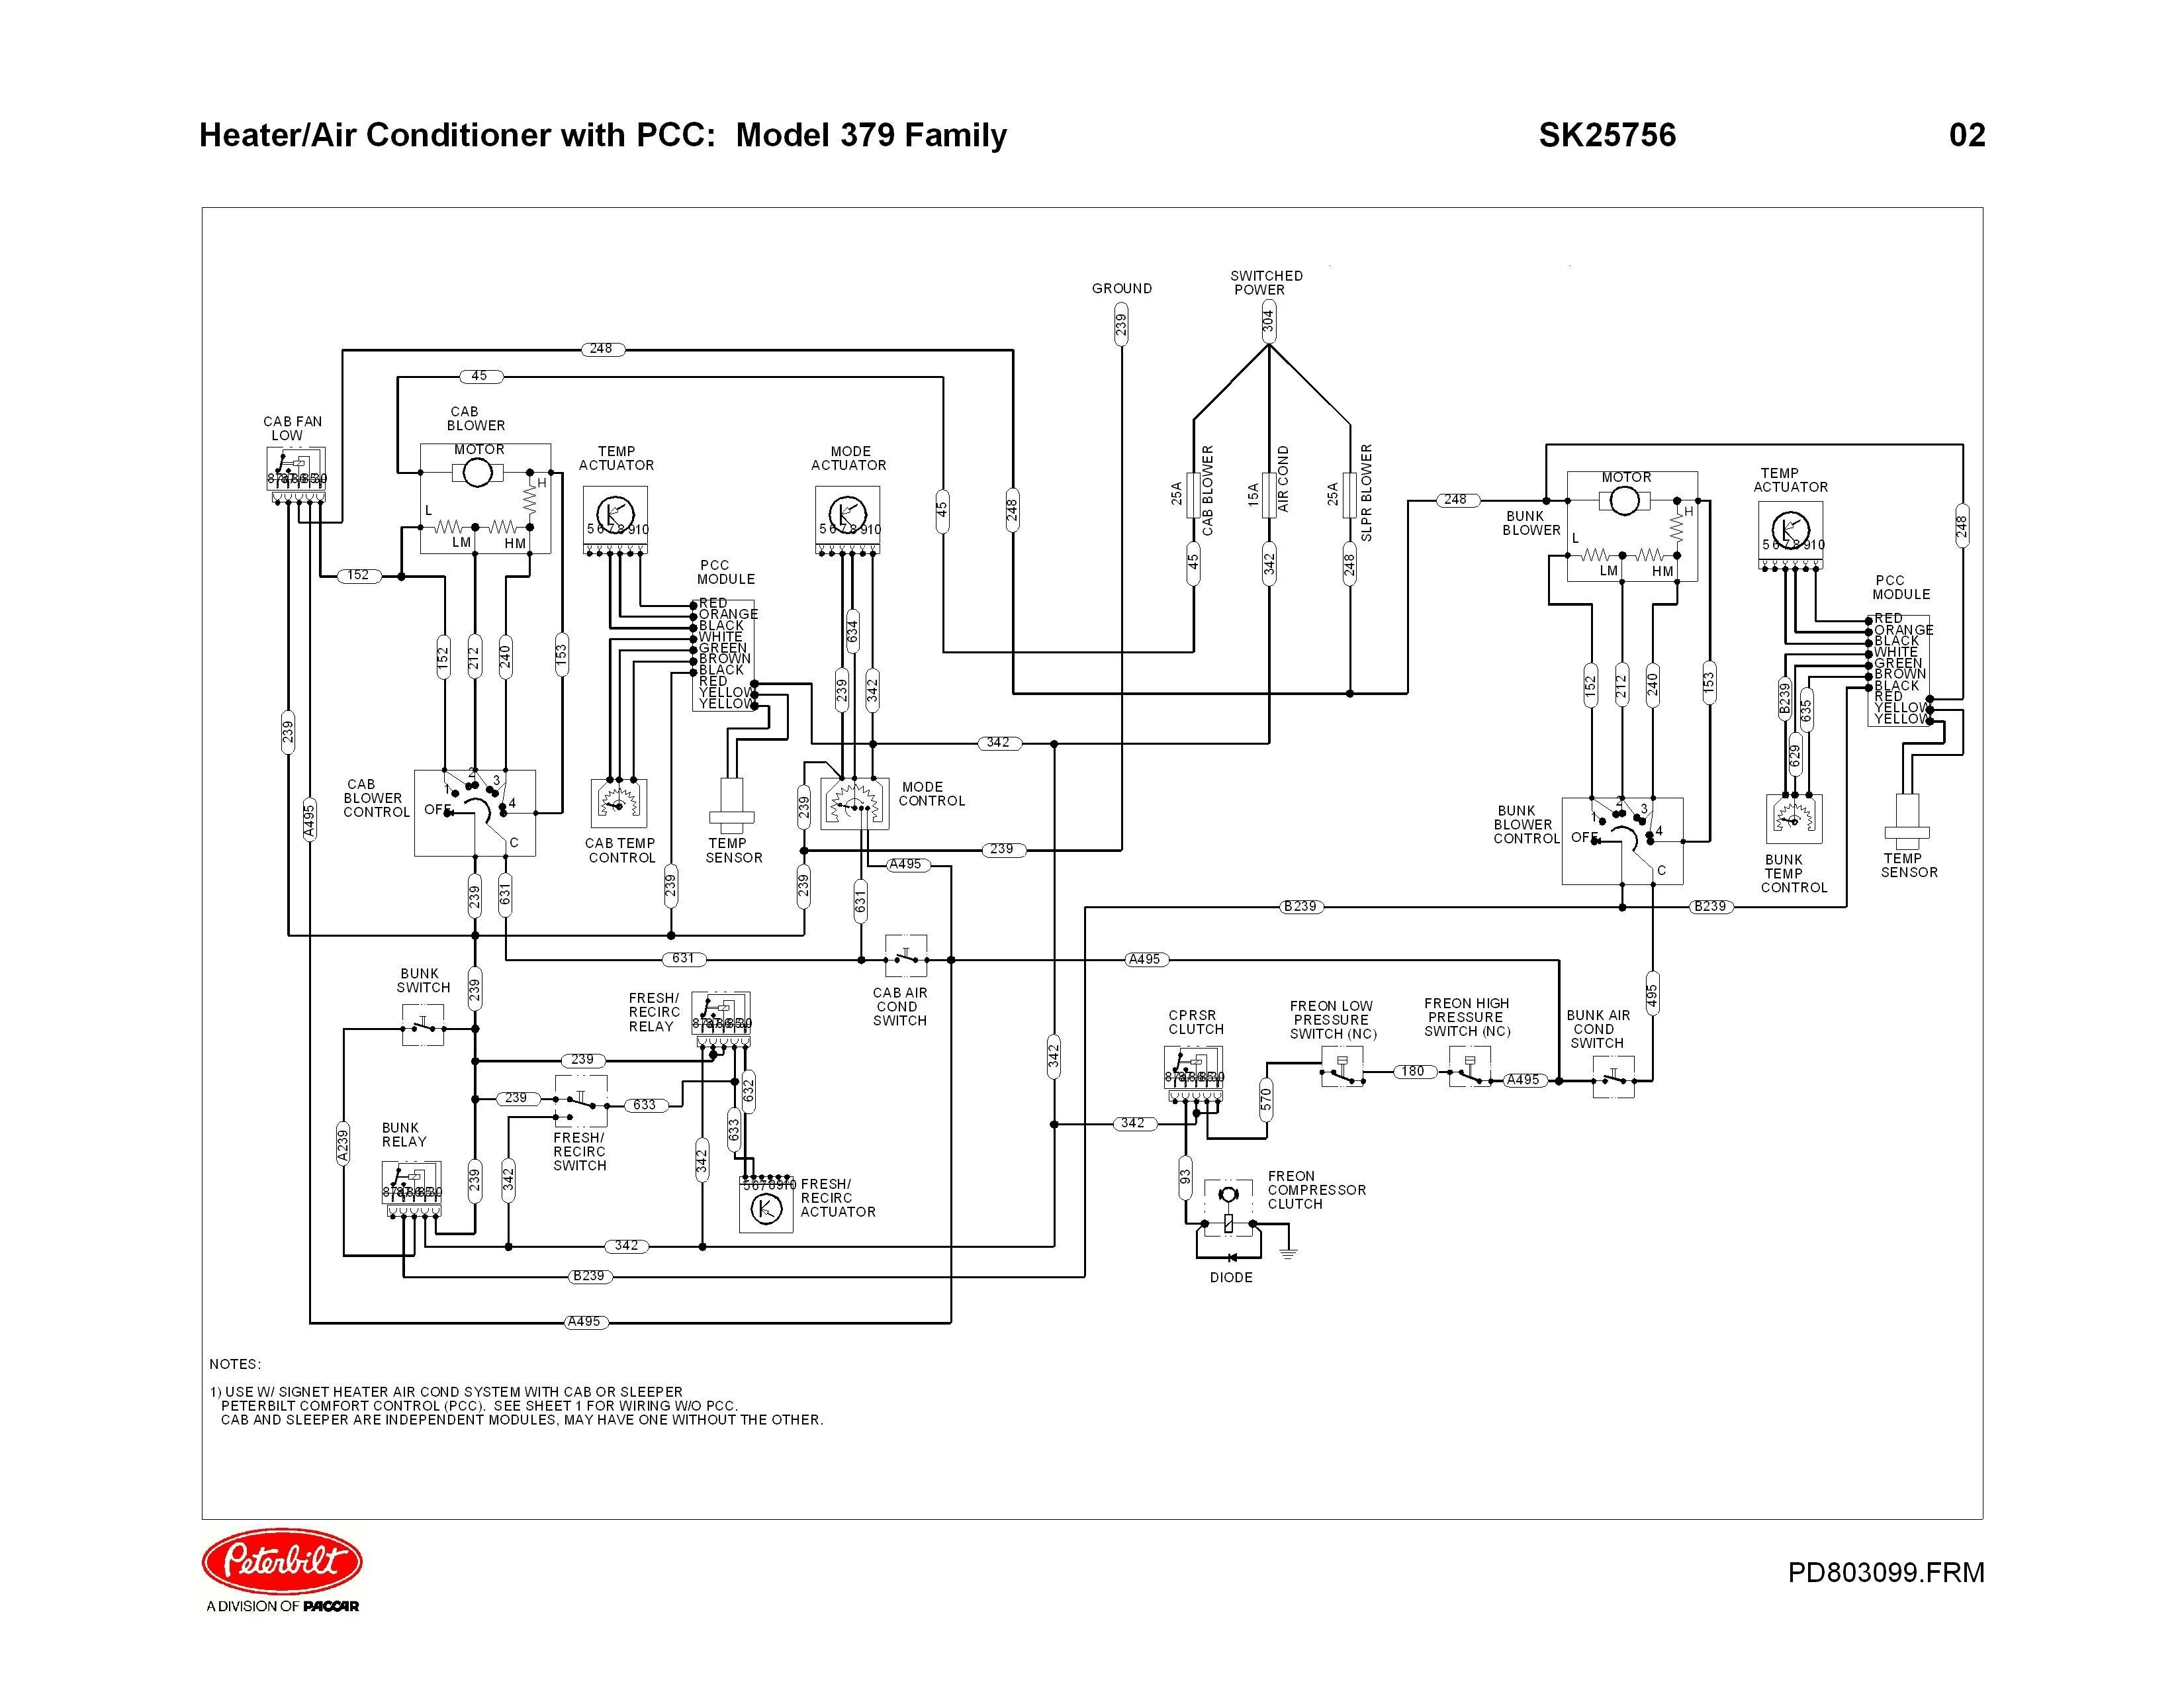 Peterbilt 379 Engine Fan Diagram | My Wiring DIagram